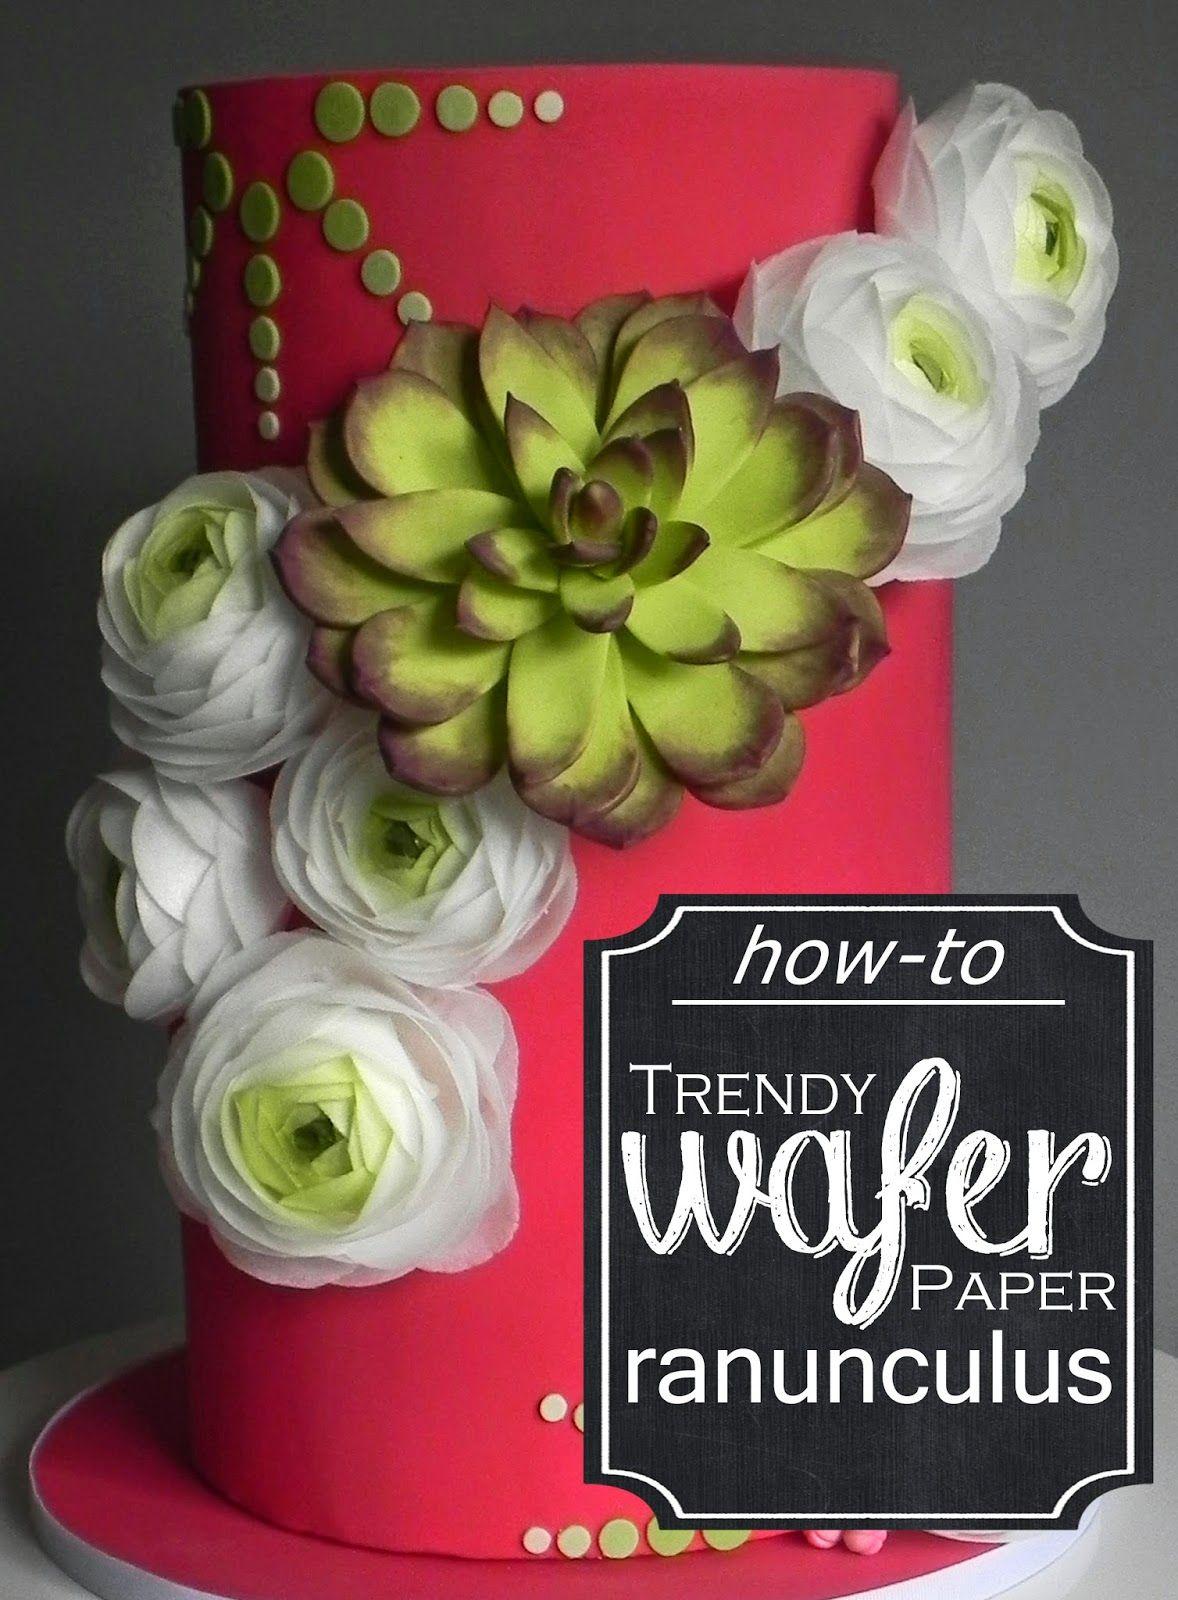 Kara S Couture Cakes The Blog Wafer Ranunculus Tutorial Fleur